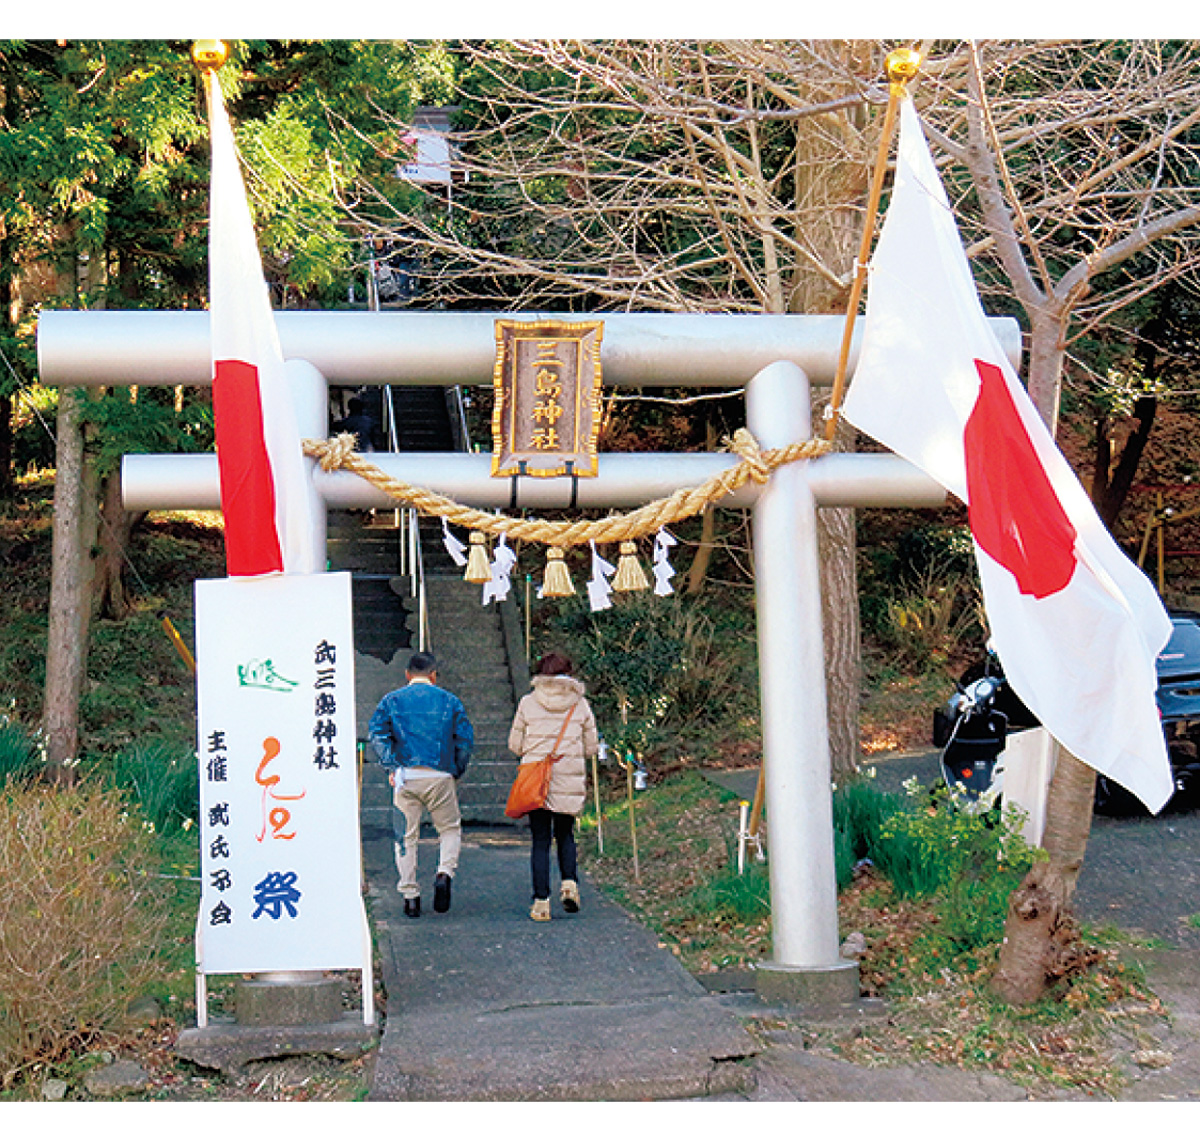 三島神社で元旦祭